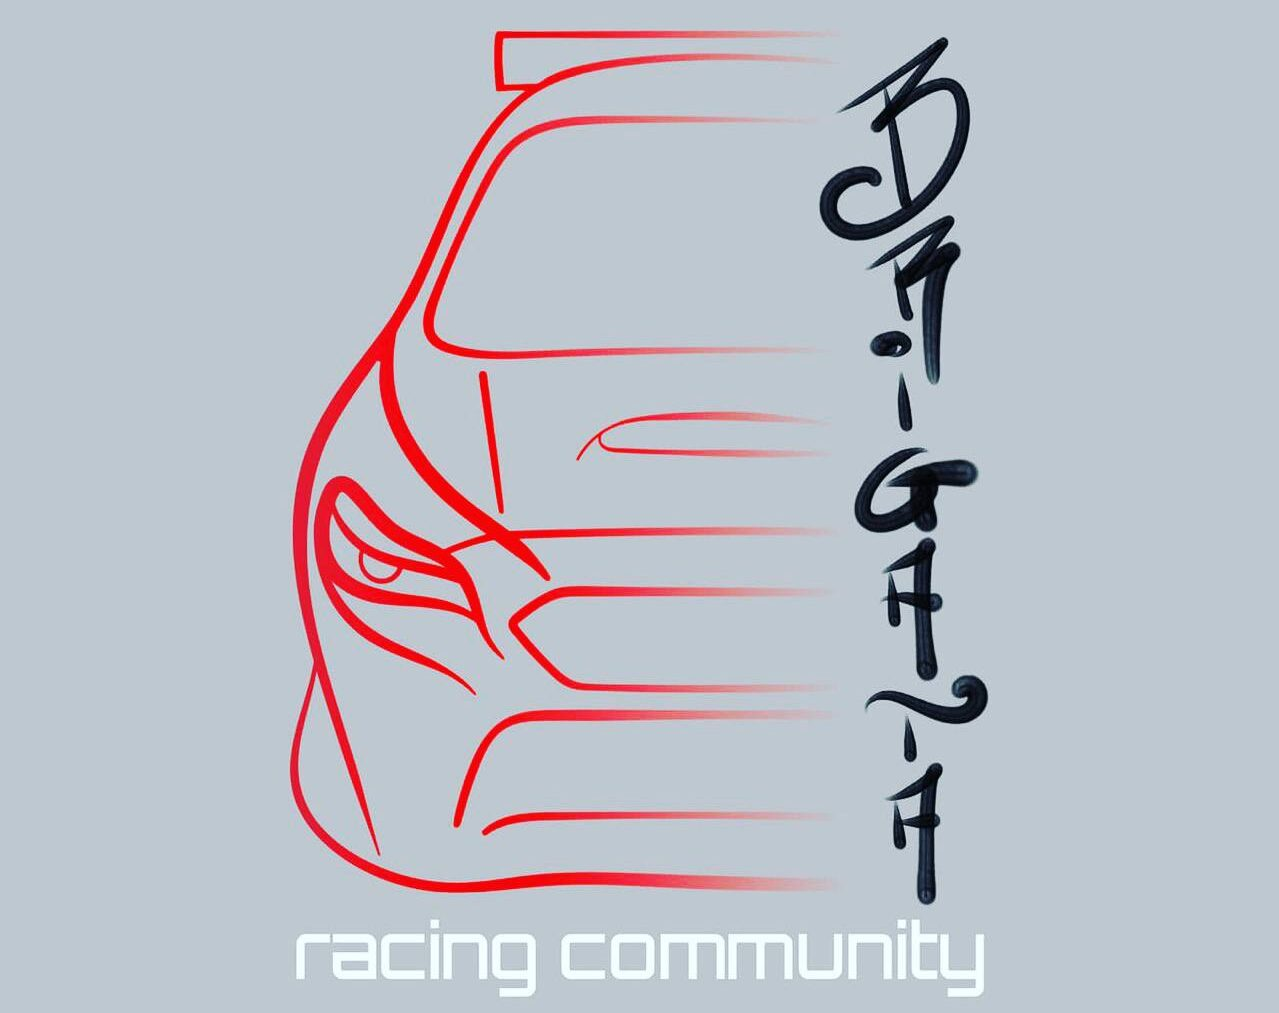 BRG racing community